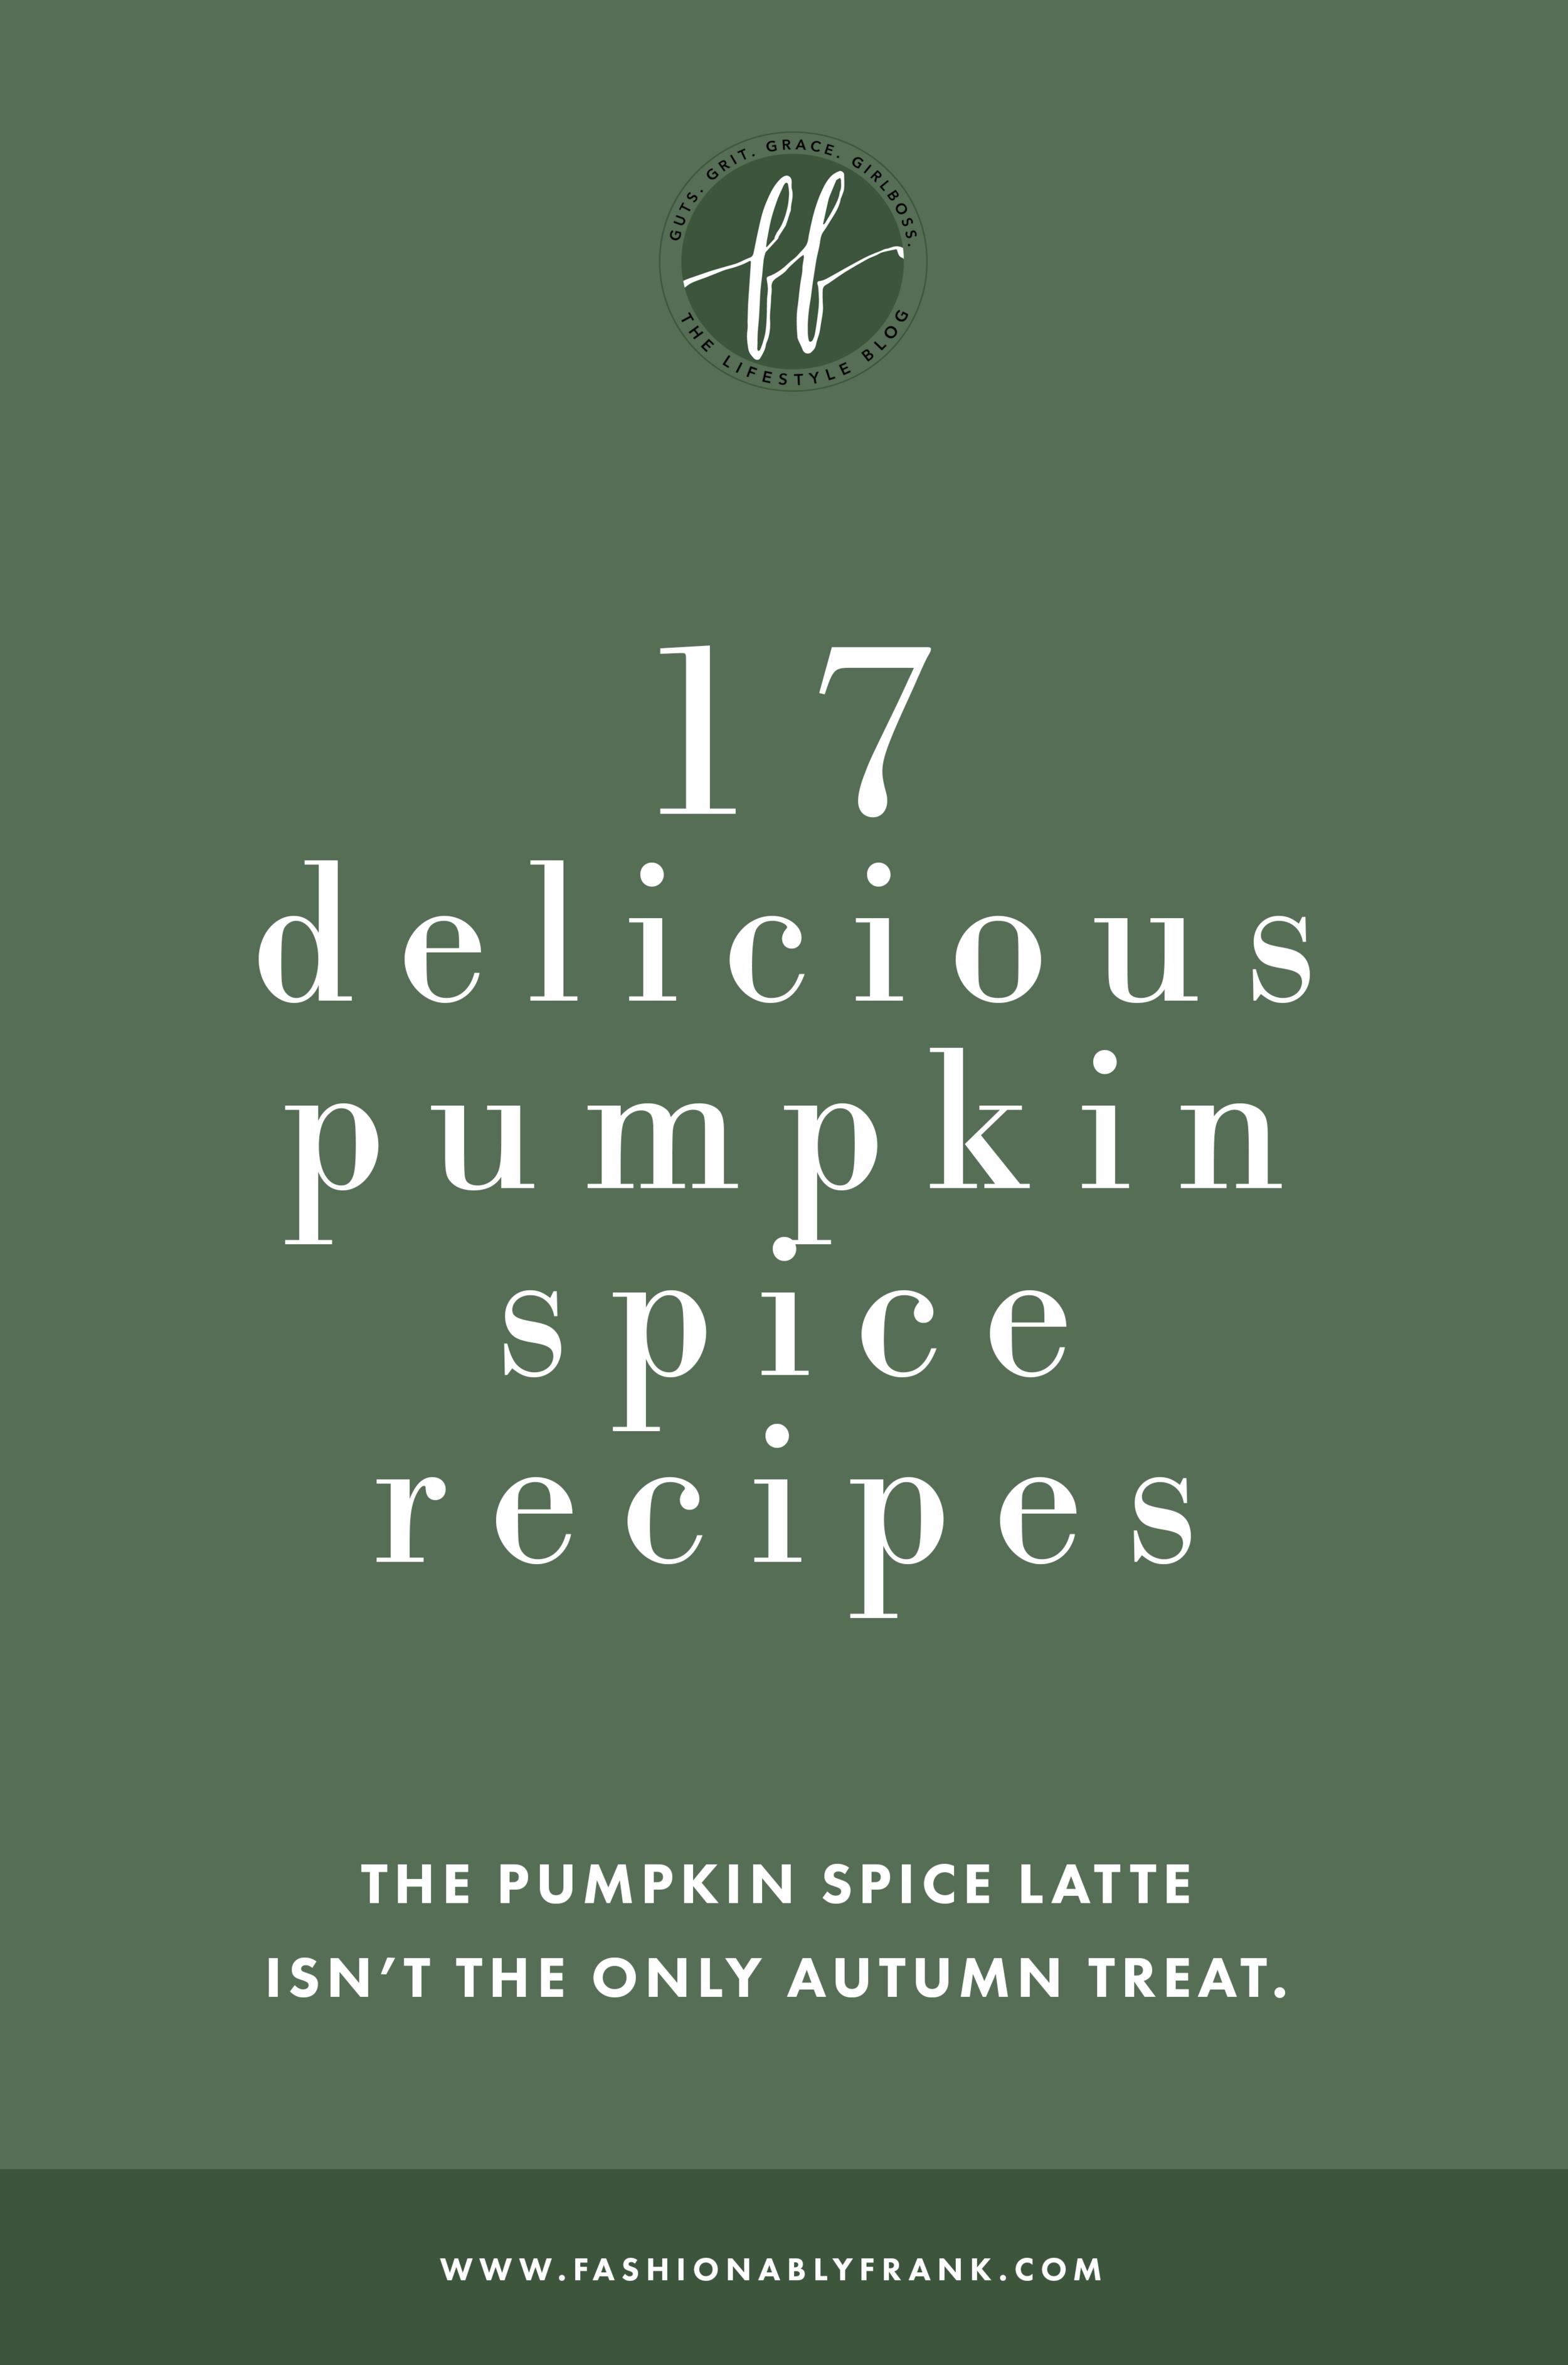 Delicious Pumpkin Spice Recipes